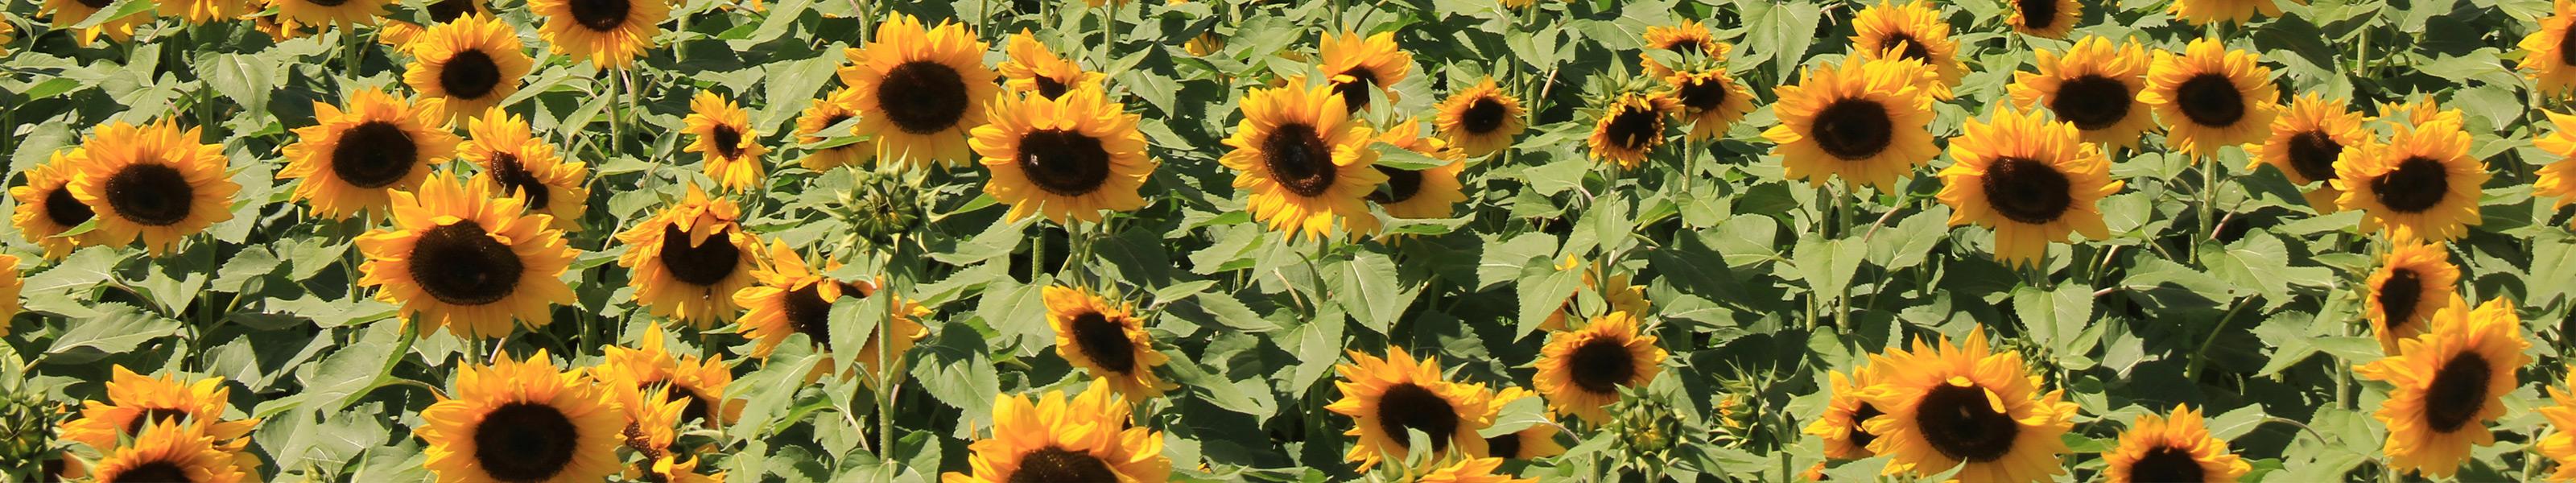 Sun.flowers header.jpg?ixlib=rails 2.1